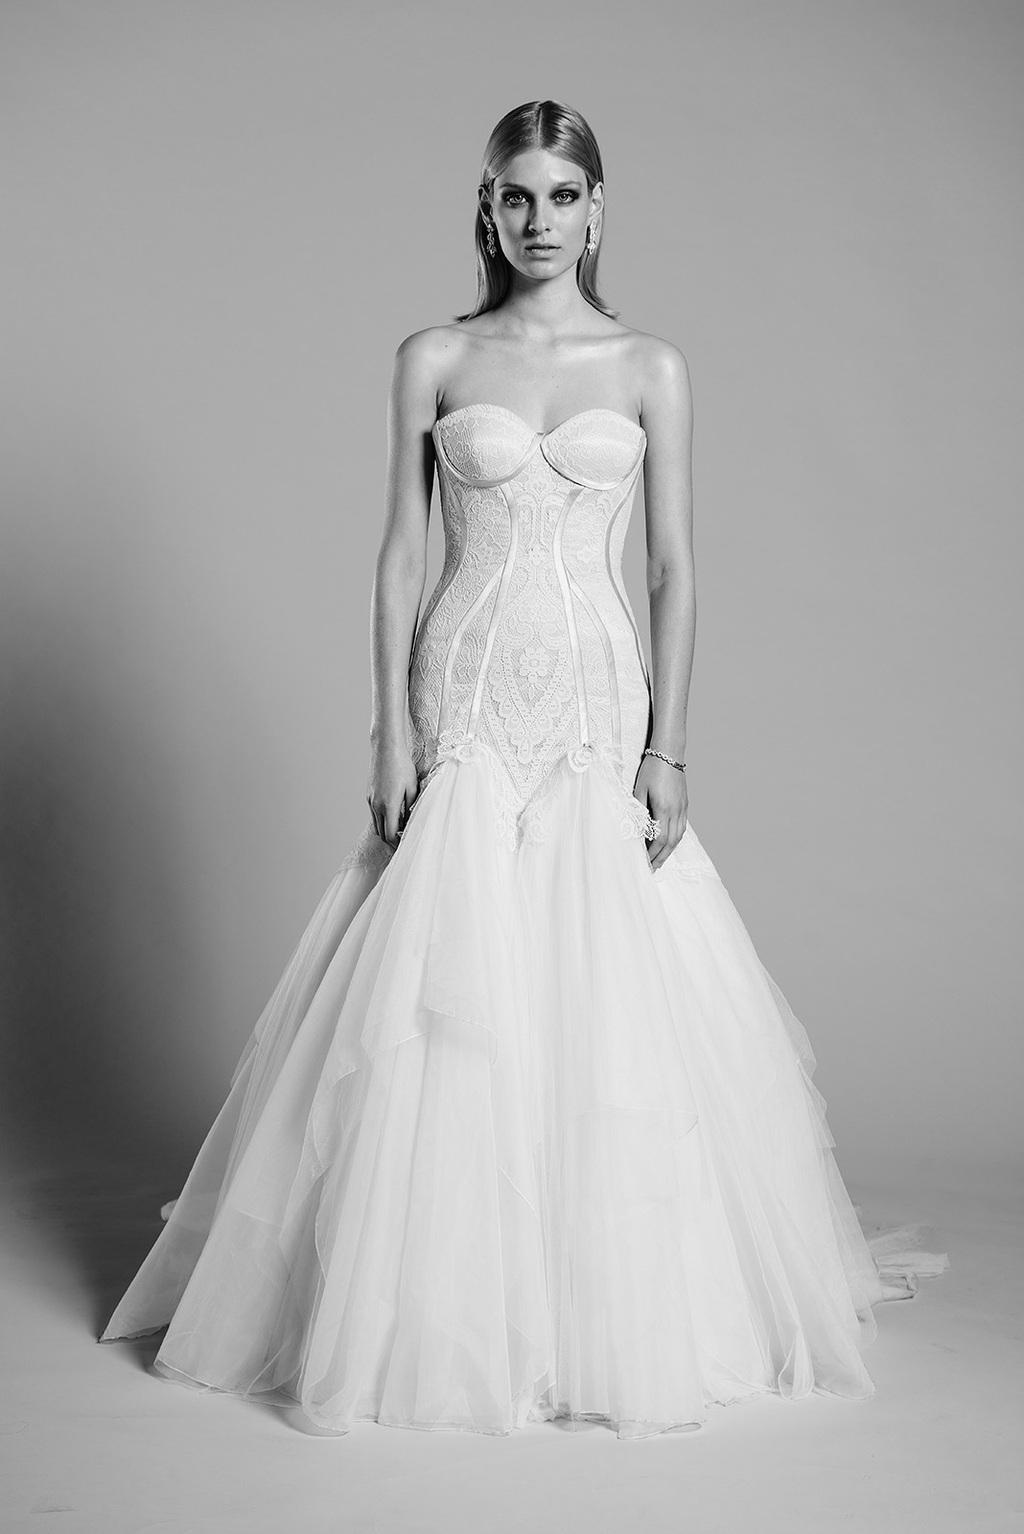 Angelette-wedding-dress-by-mariana-hardwick-2014-bridal.full